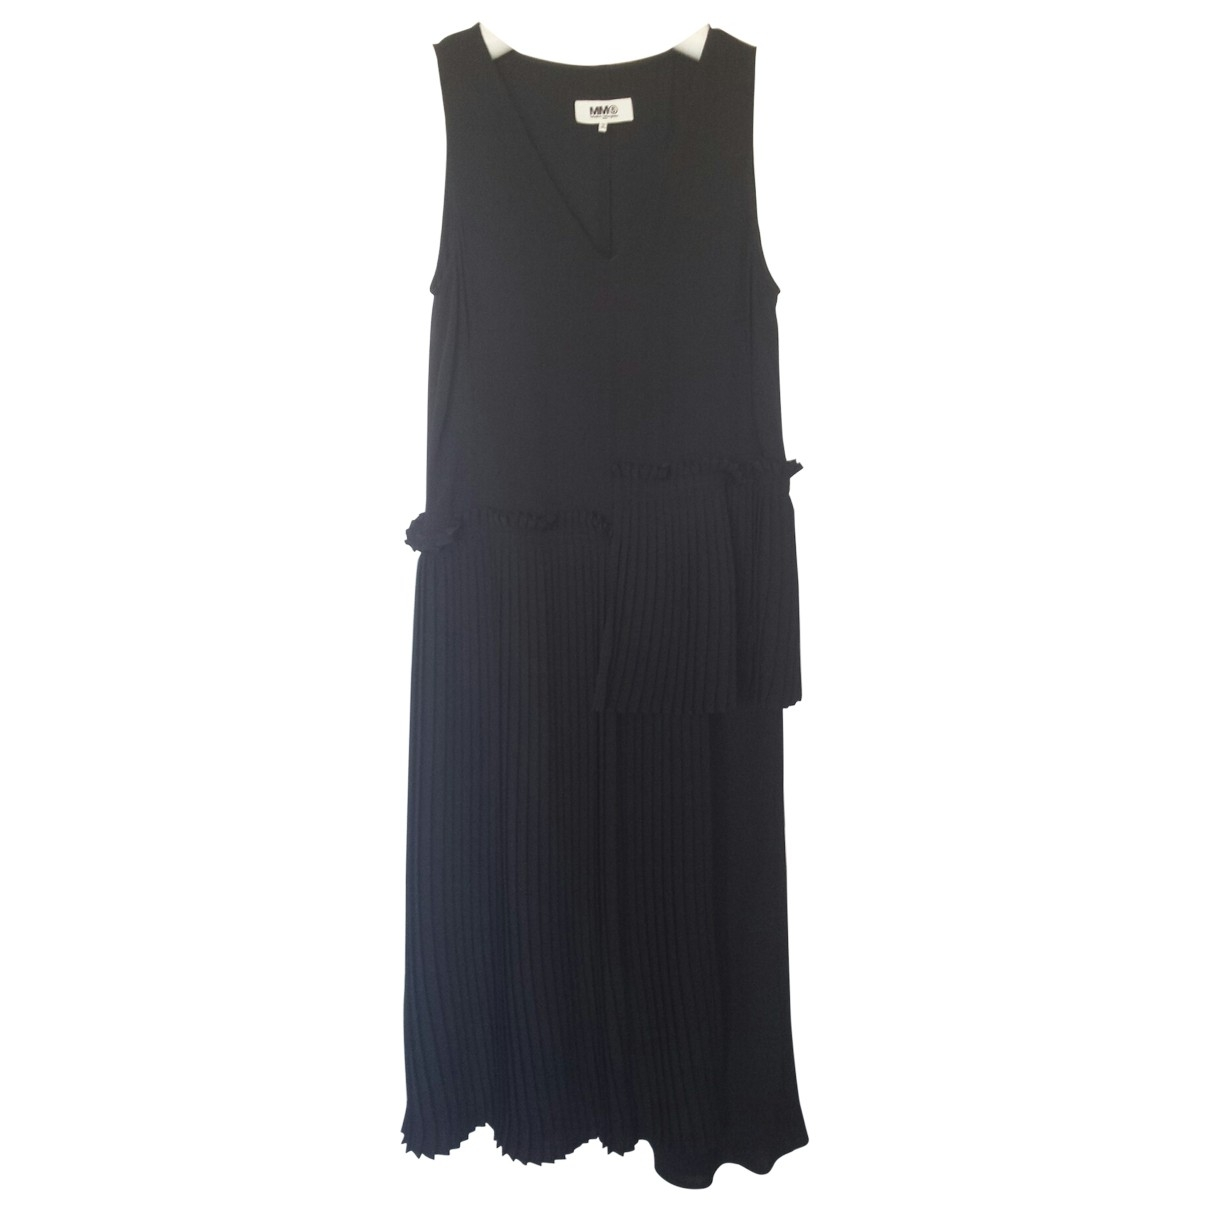 Mm6 \N Kleid in  Schwarz Synthetik